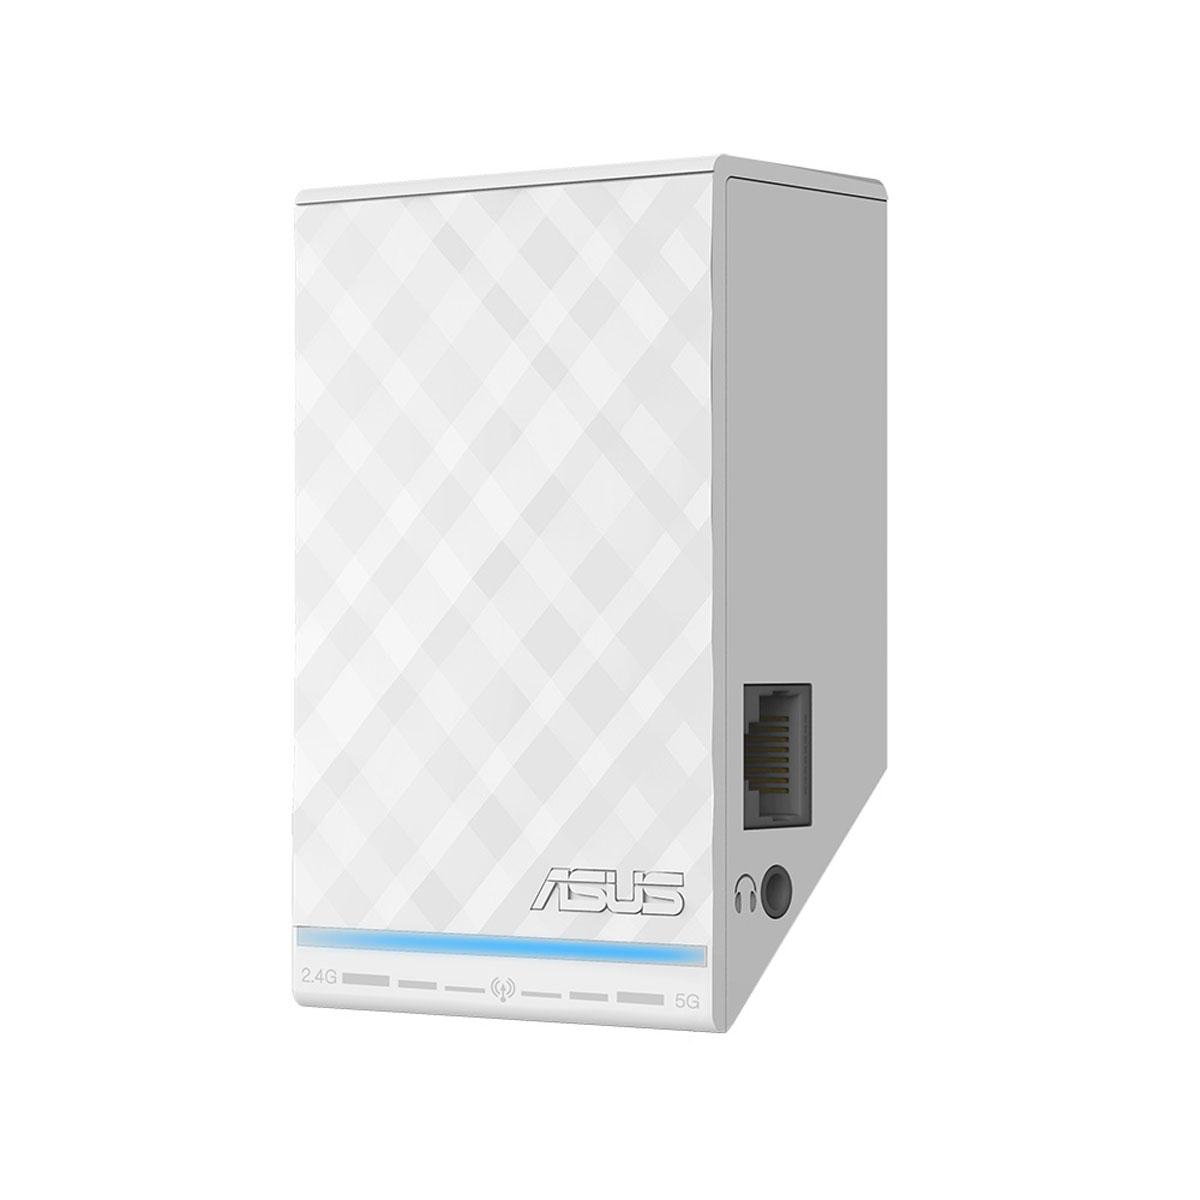 Point d'accès WiFi ASUS RP-N53 Repeteur Dual N600 Point d'accès sans fil Wi-Fi N 600 Mbps Dual band